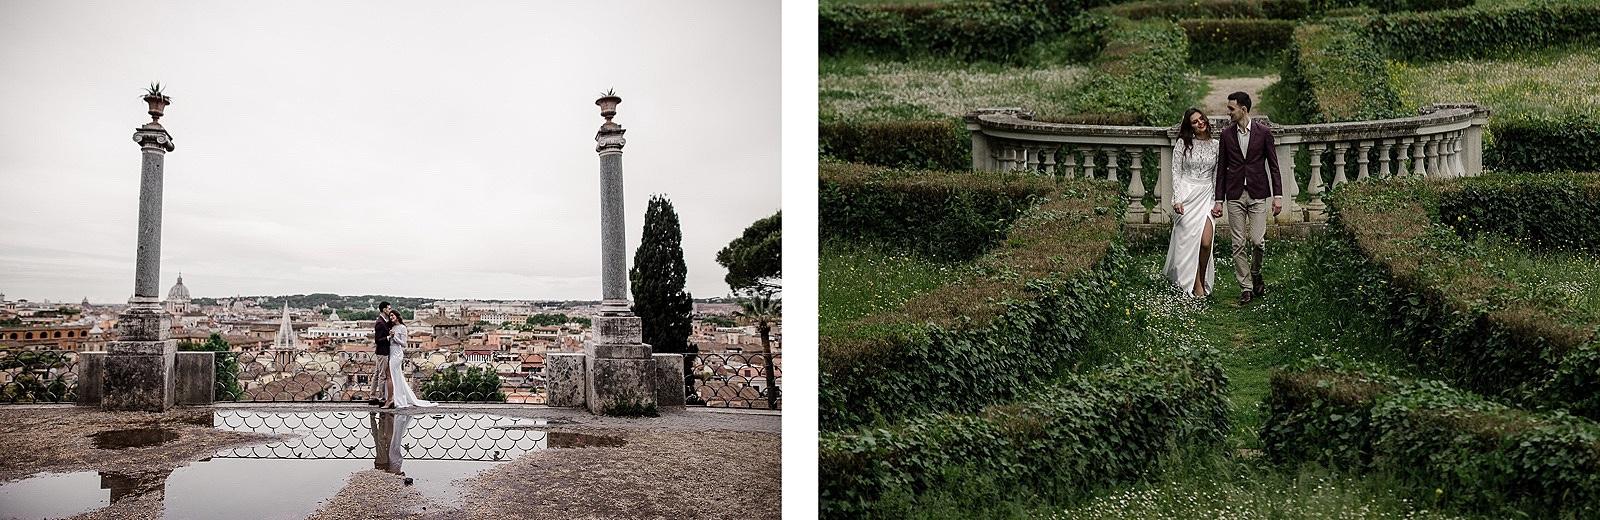 Fotomagoria+Wedding+Rome+Photographer+6.jpg